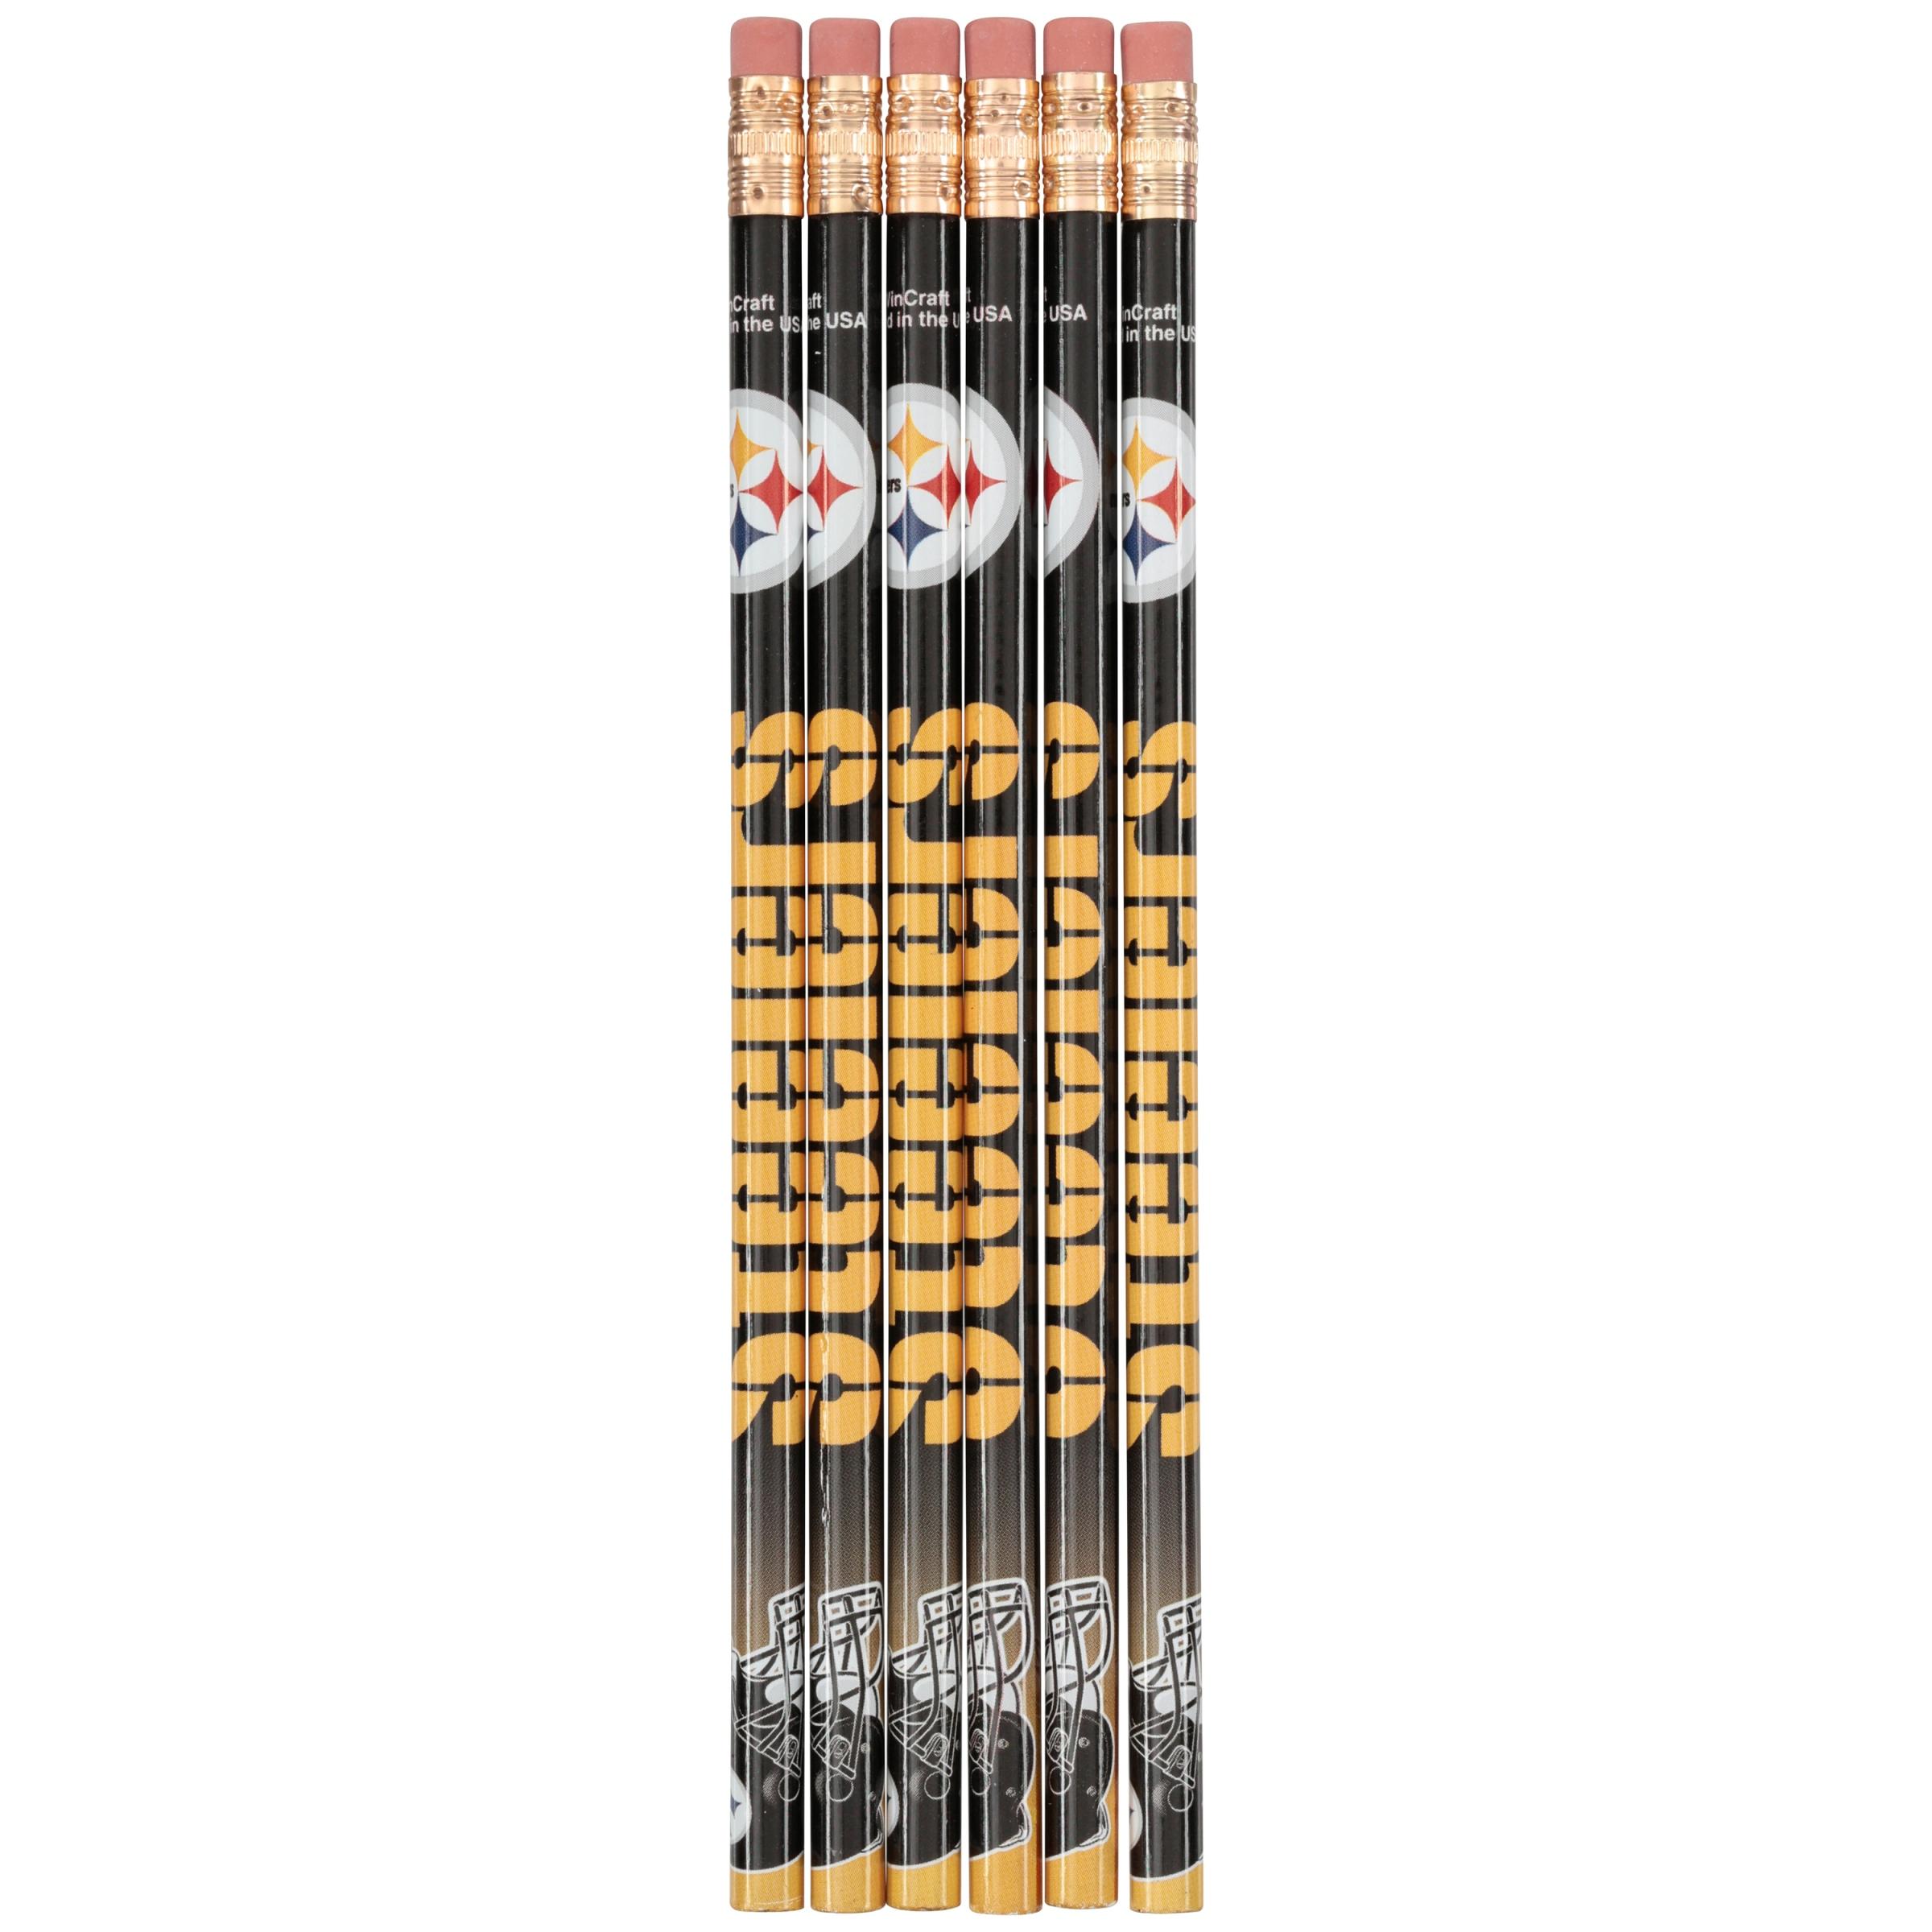 NFL Steelers Pencils 6 ct Pack